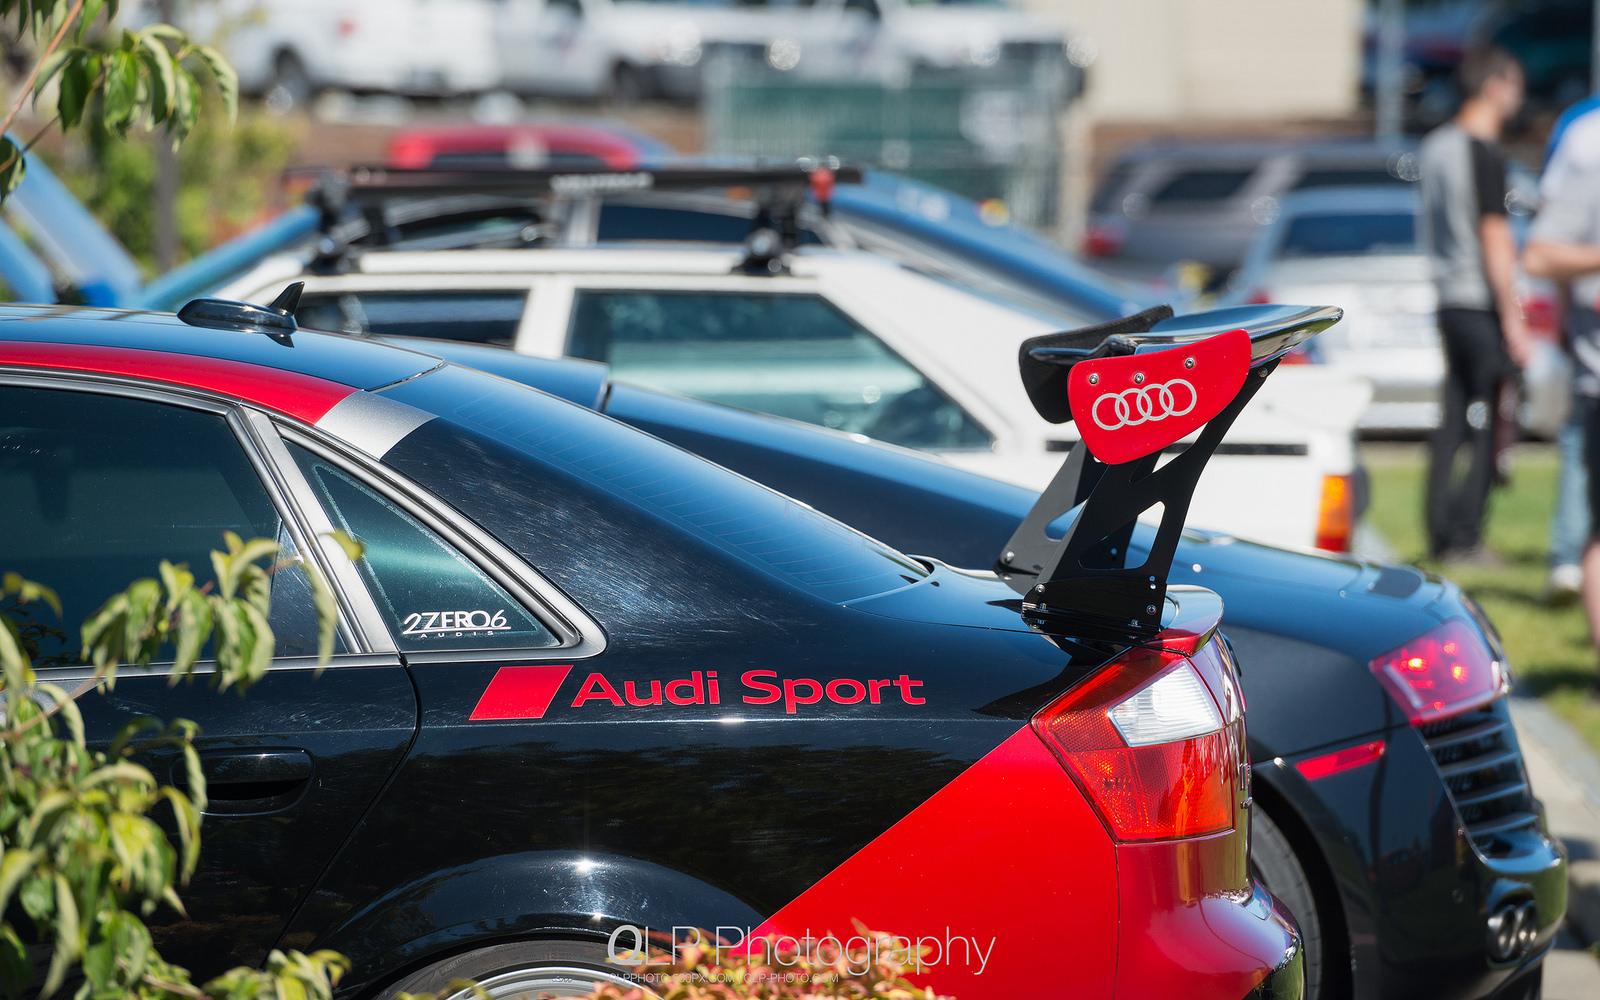 In Photos: Audi Expo 2016